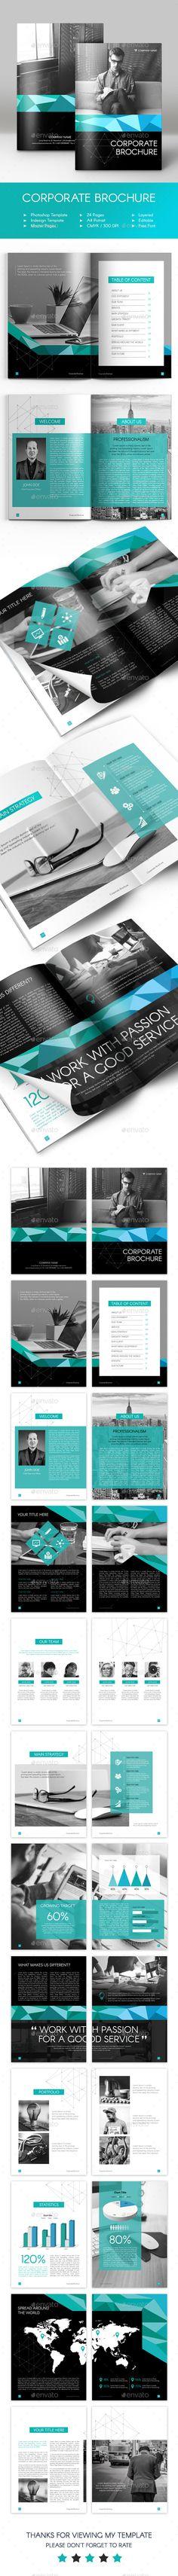 Corporate Brochure Template. Download here: http://graphicriver.net/item/corporate-brochure/14642851?ref=ksioks